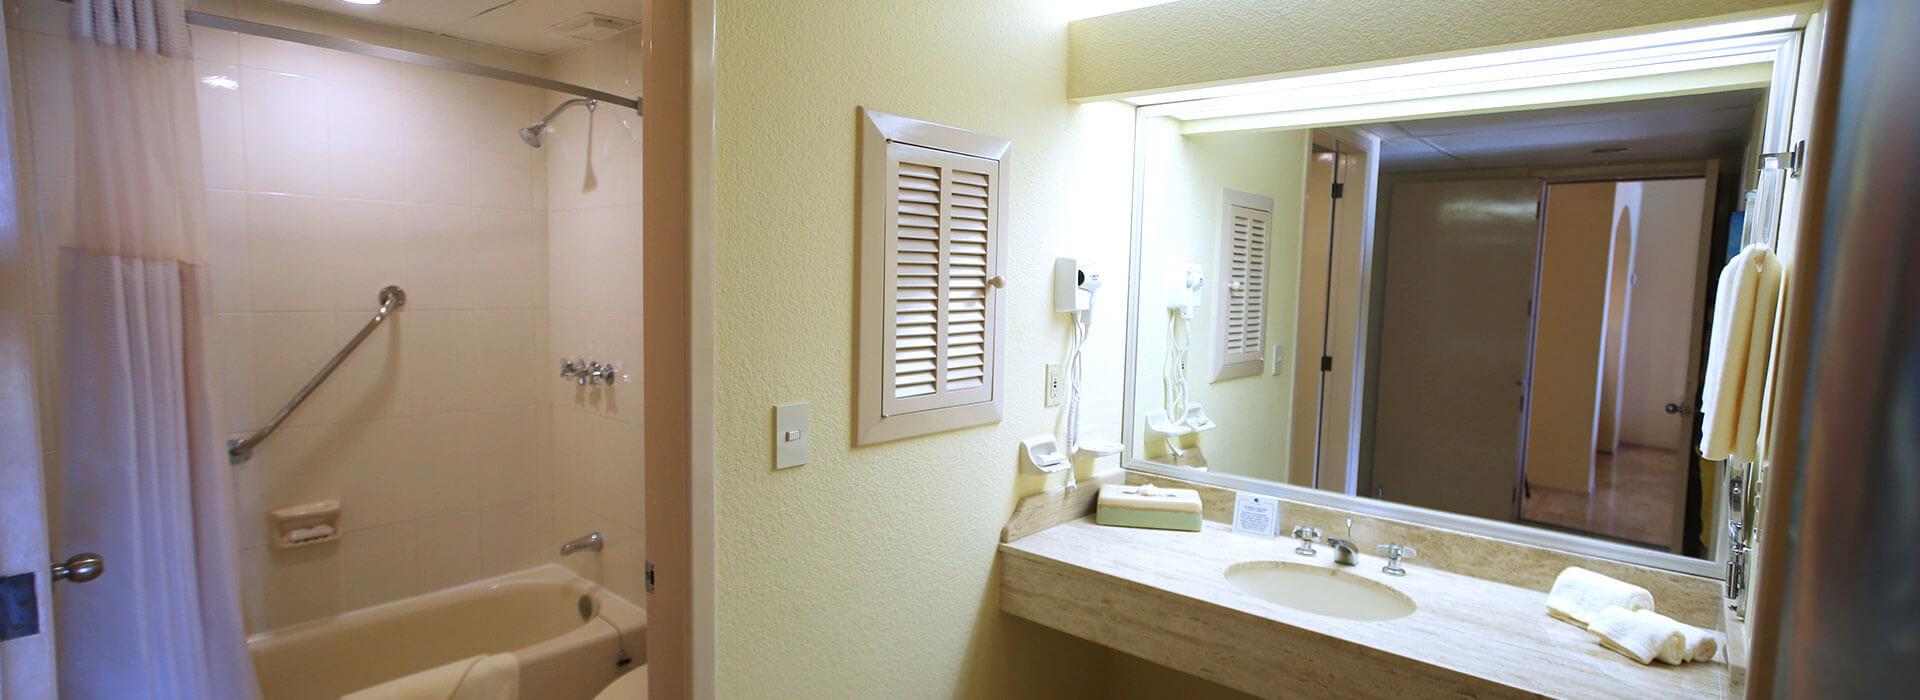 private bathroom in cancun suite